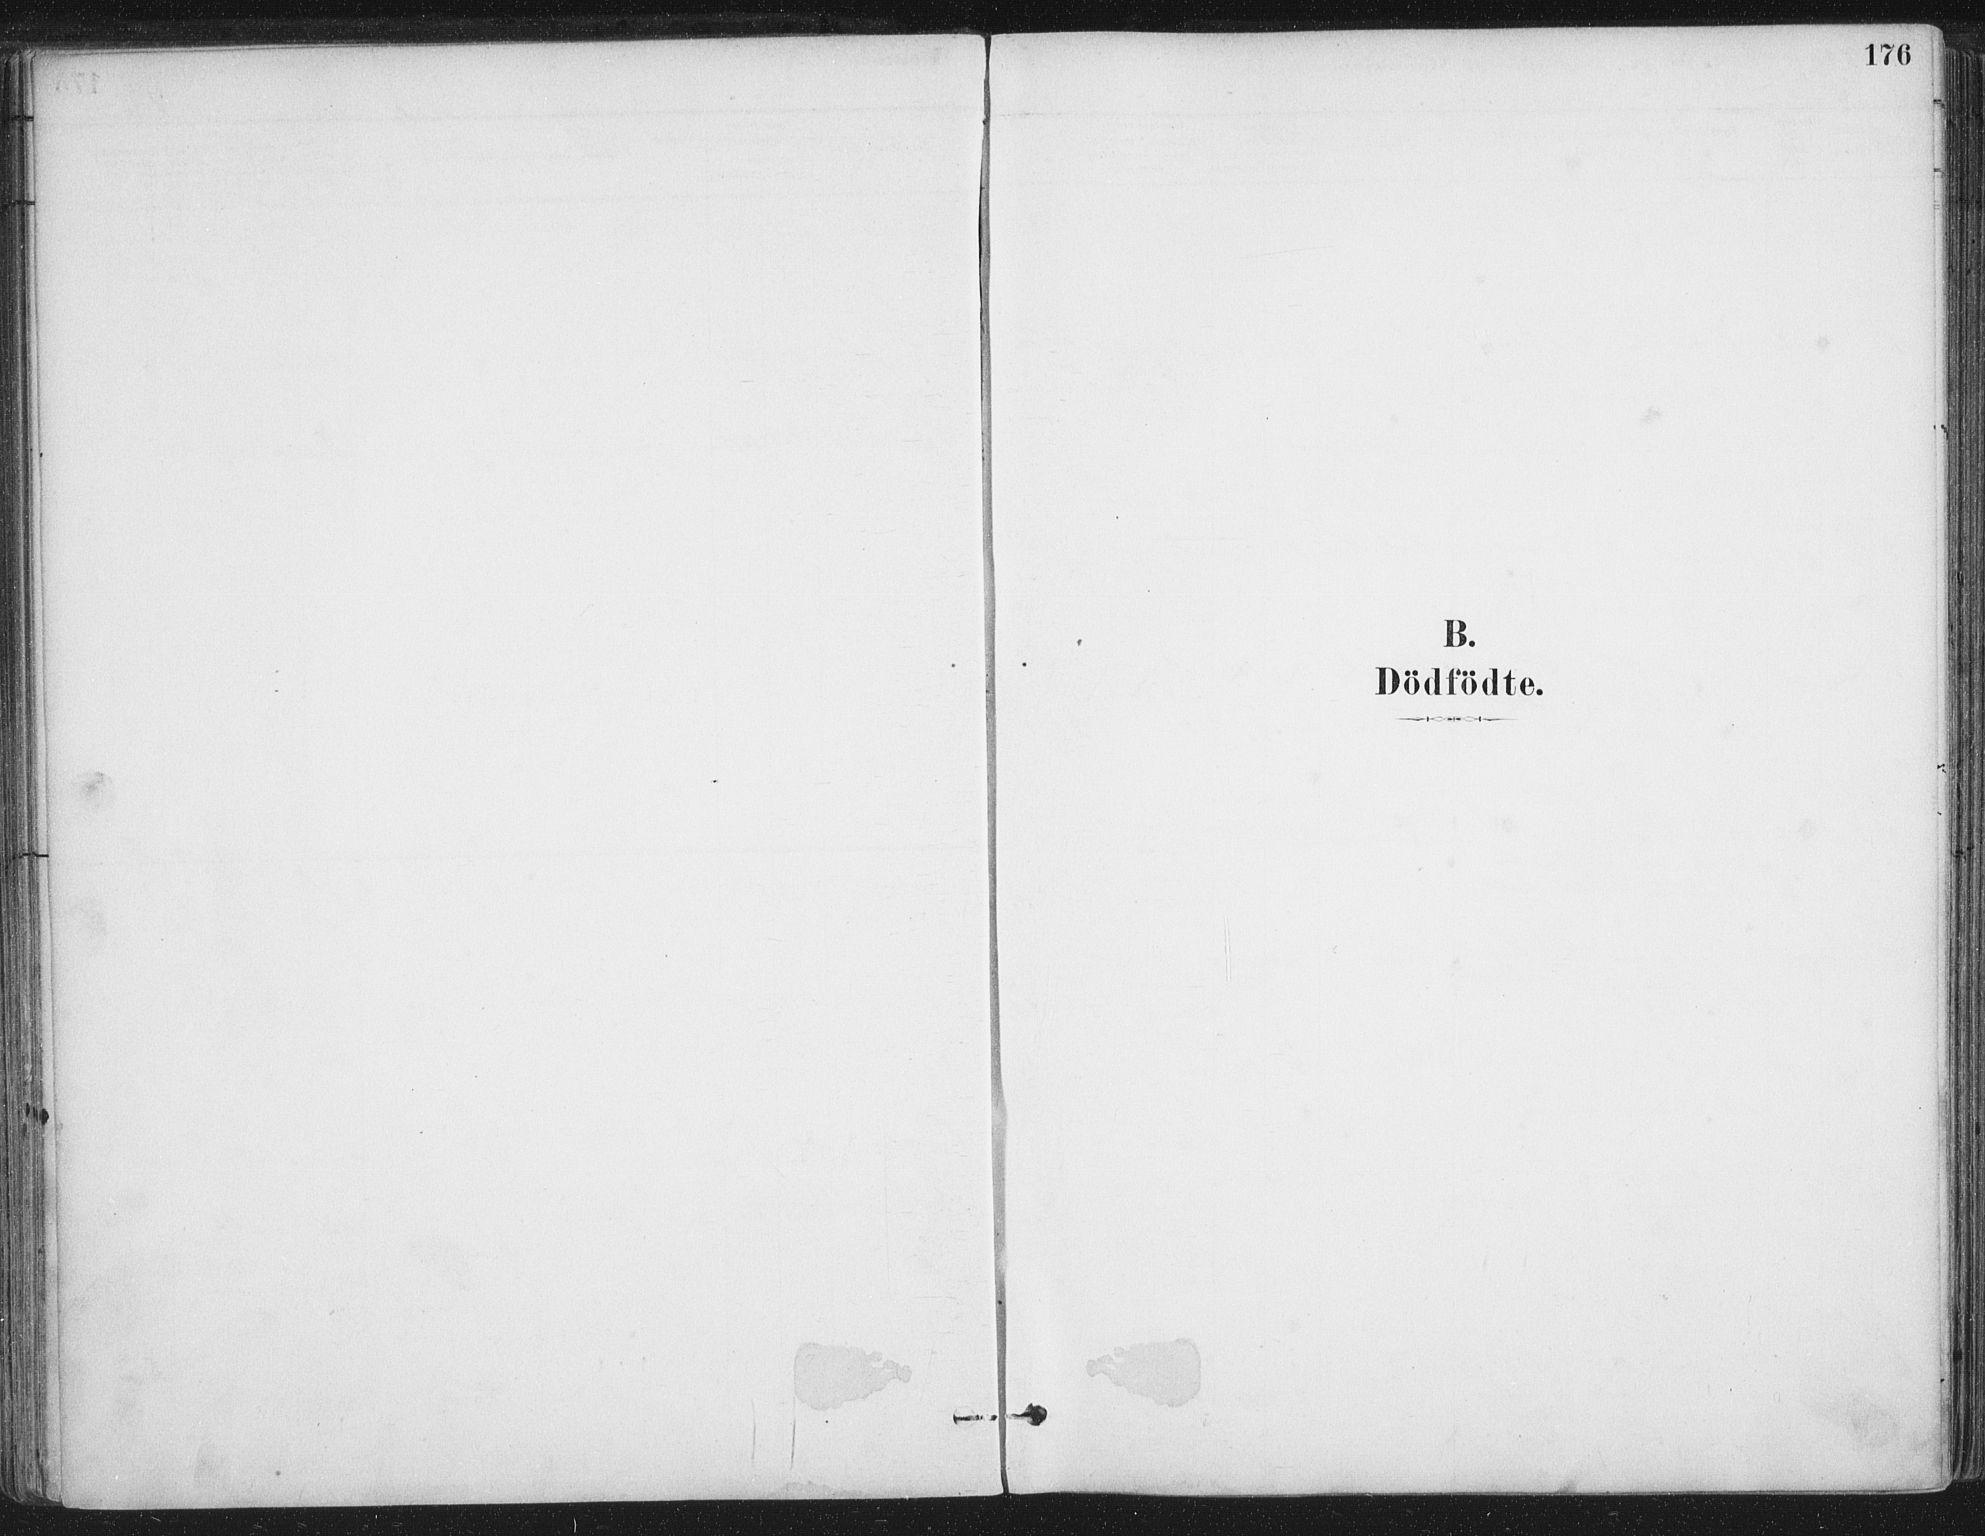 SAT, Ministerialprotokoller, klokkerbøker og fødselsregistre - Nordland, 888/L1244: Ministerialbok nr. 888A10, 1880-1890, s. 176